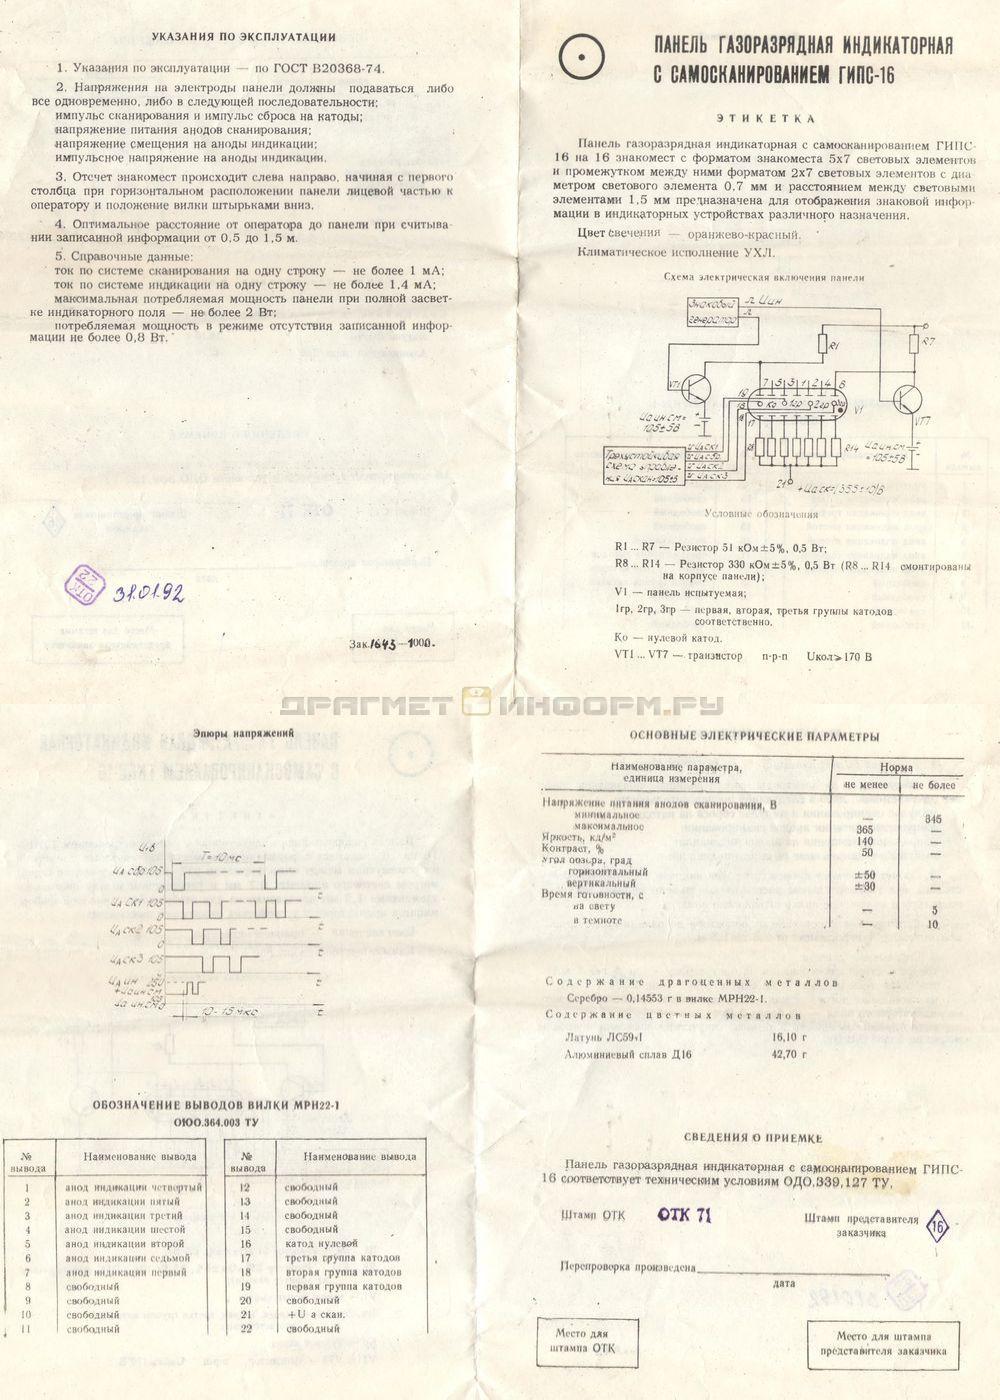 Формуляр МРН22-1 в